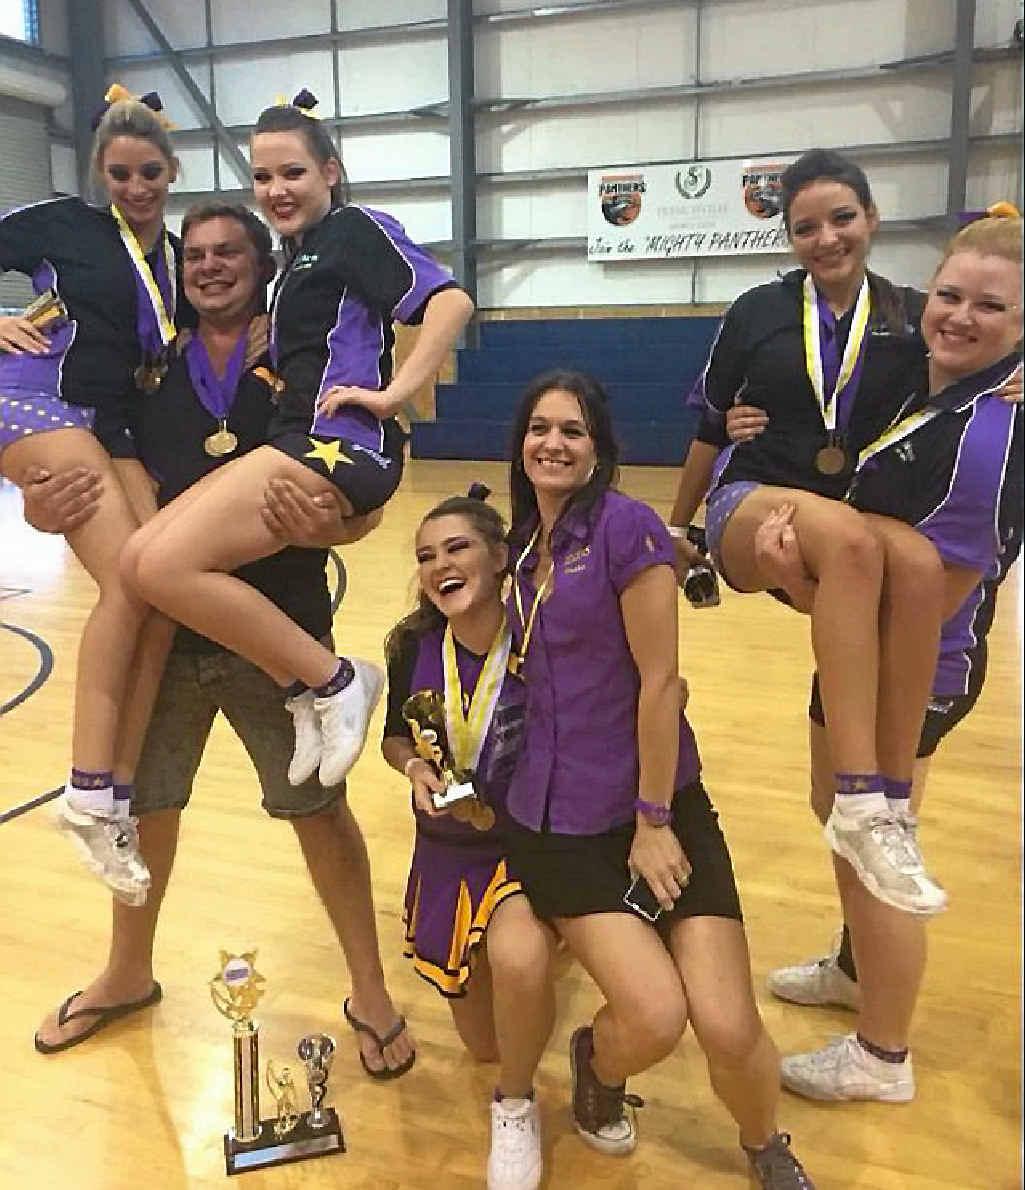 SHOOT FOR THE STARS: DDS Stars Cheerleader Zaden Bryant with Jessica O'Brien, Laura Gilbar, Shannon Spreadborough, Debbie Scott, Alyce Hall and Niki Outridge.